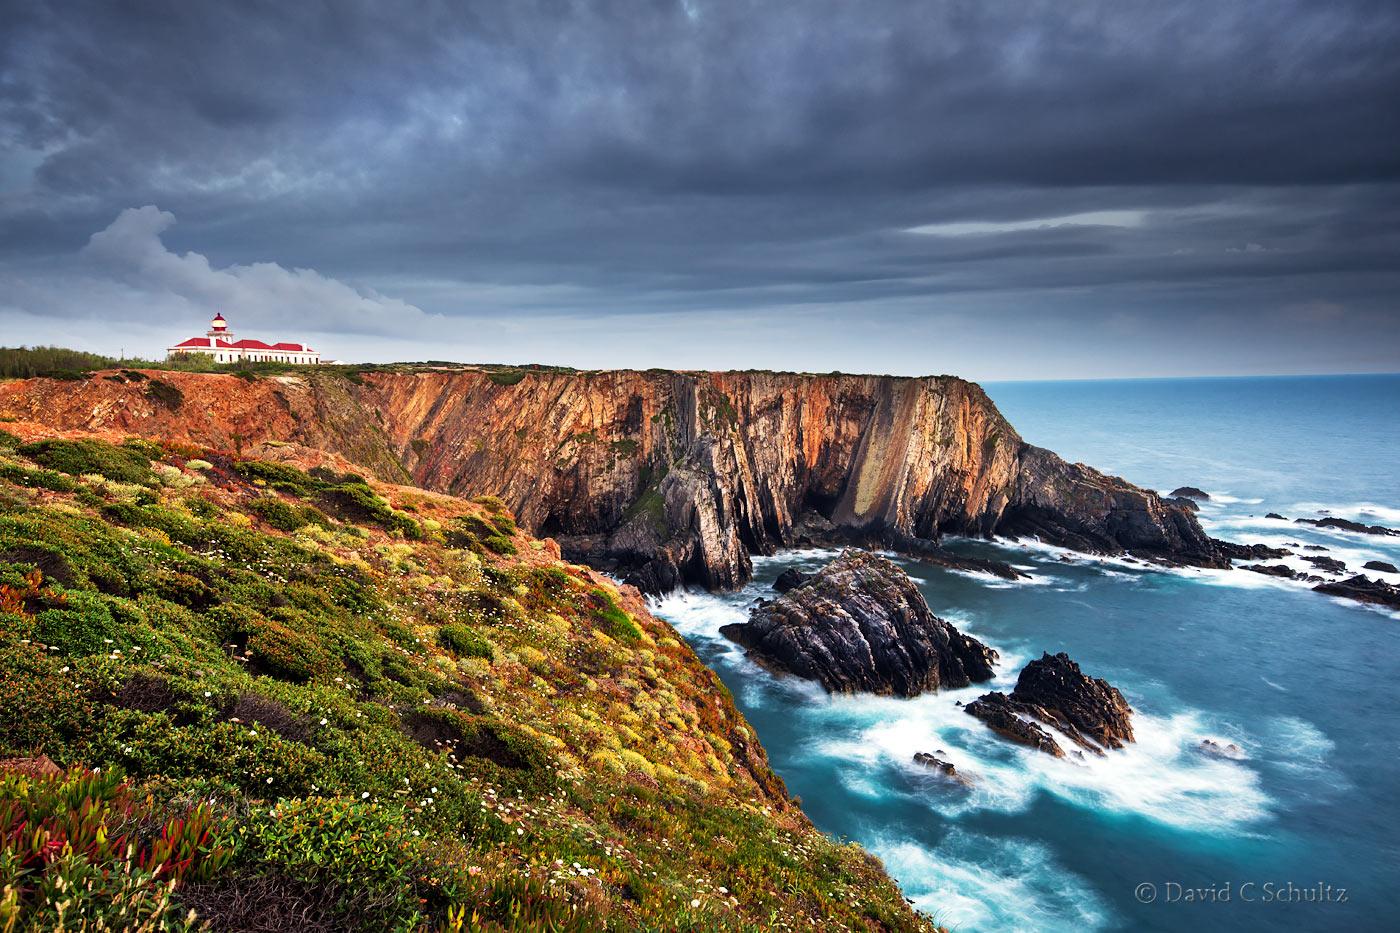 Cabo Sardo Lighthouse, Portugal - Image #57-1882